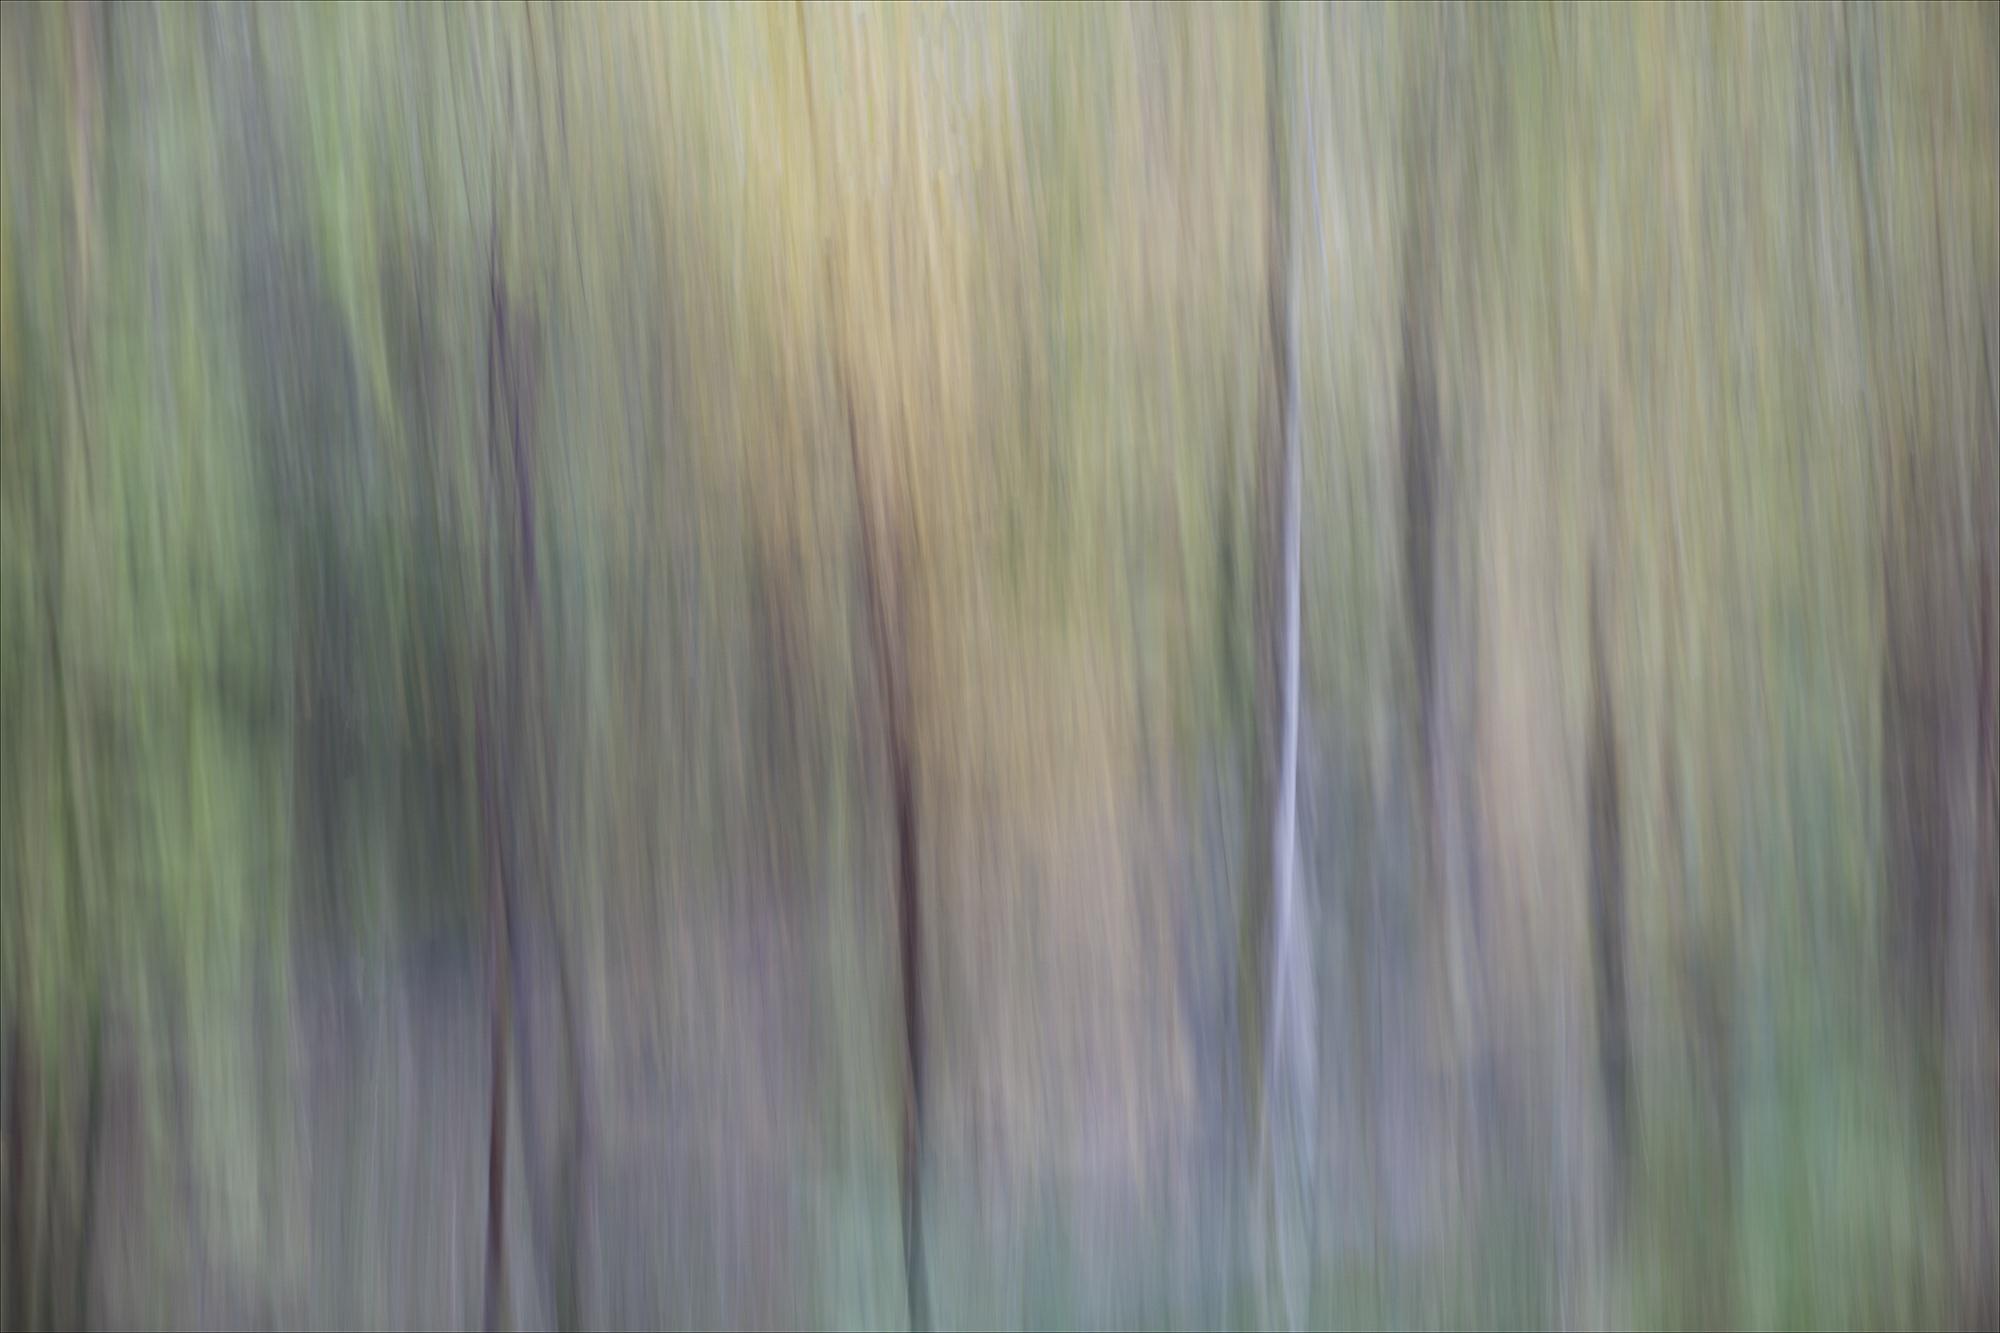 07 Woodland #1.jpg